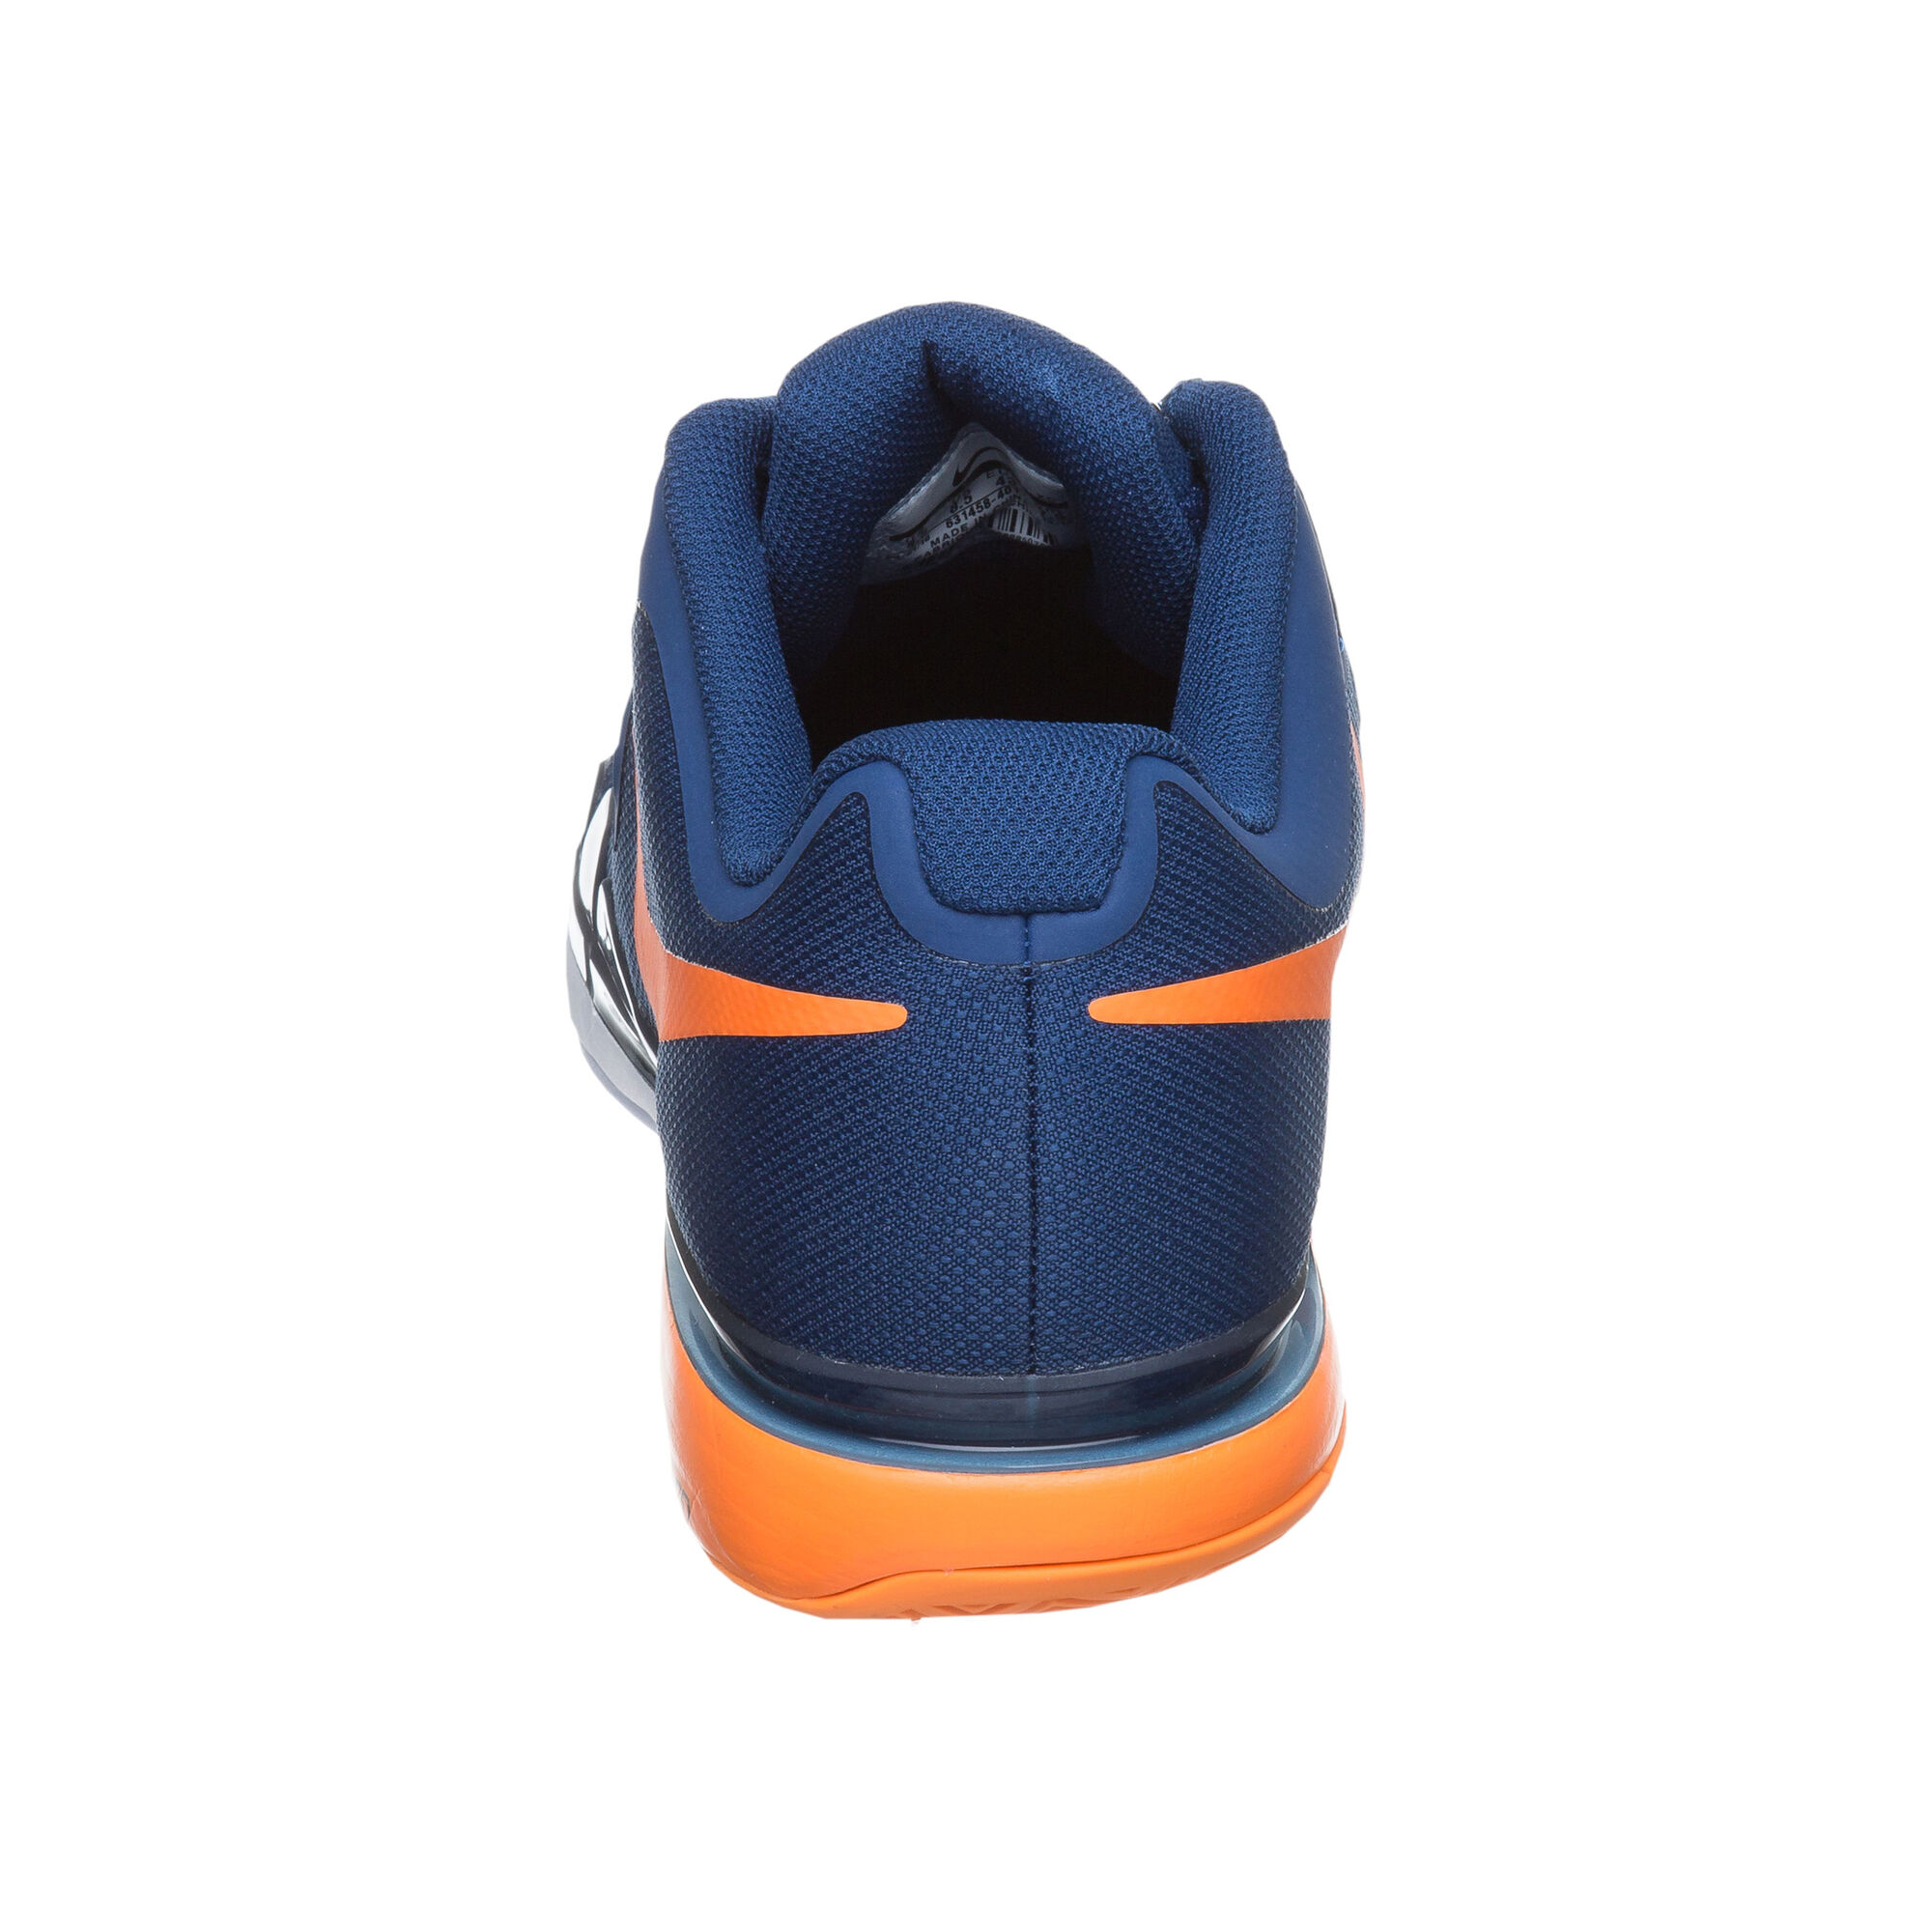 promo code c32e0 50220 Nike · Nike · Nike · Nike · Nike · Nike · Nike · Nike · Nike · Nike. Zoom  Vapor 9.5 Tour ...